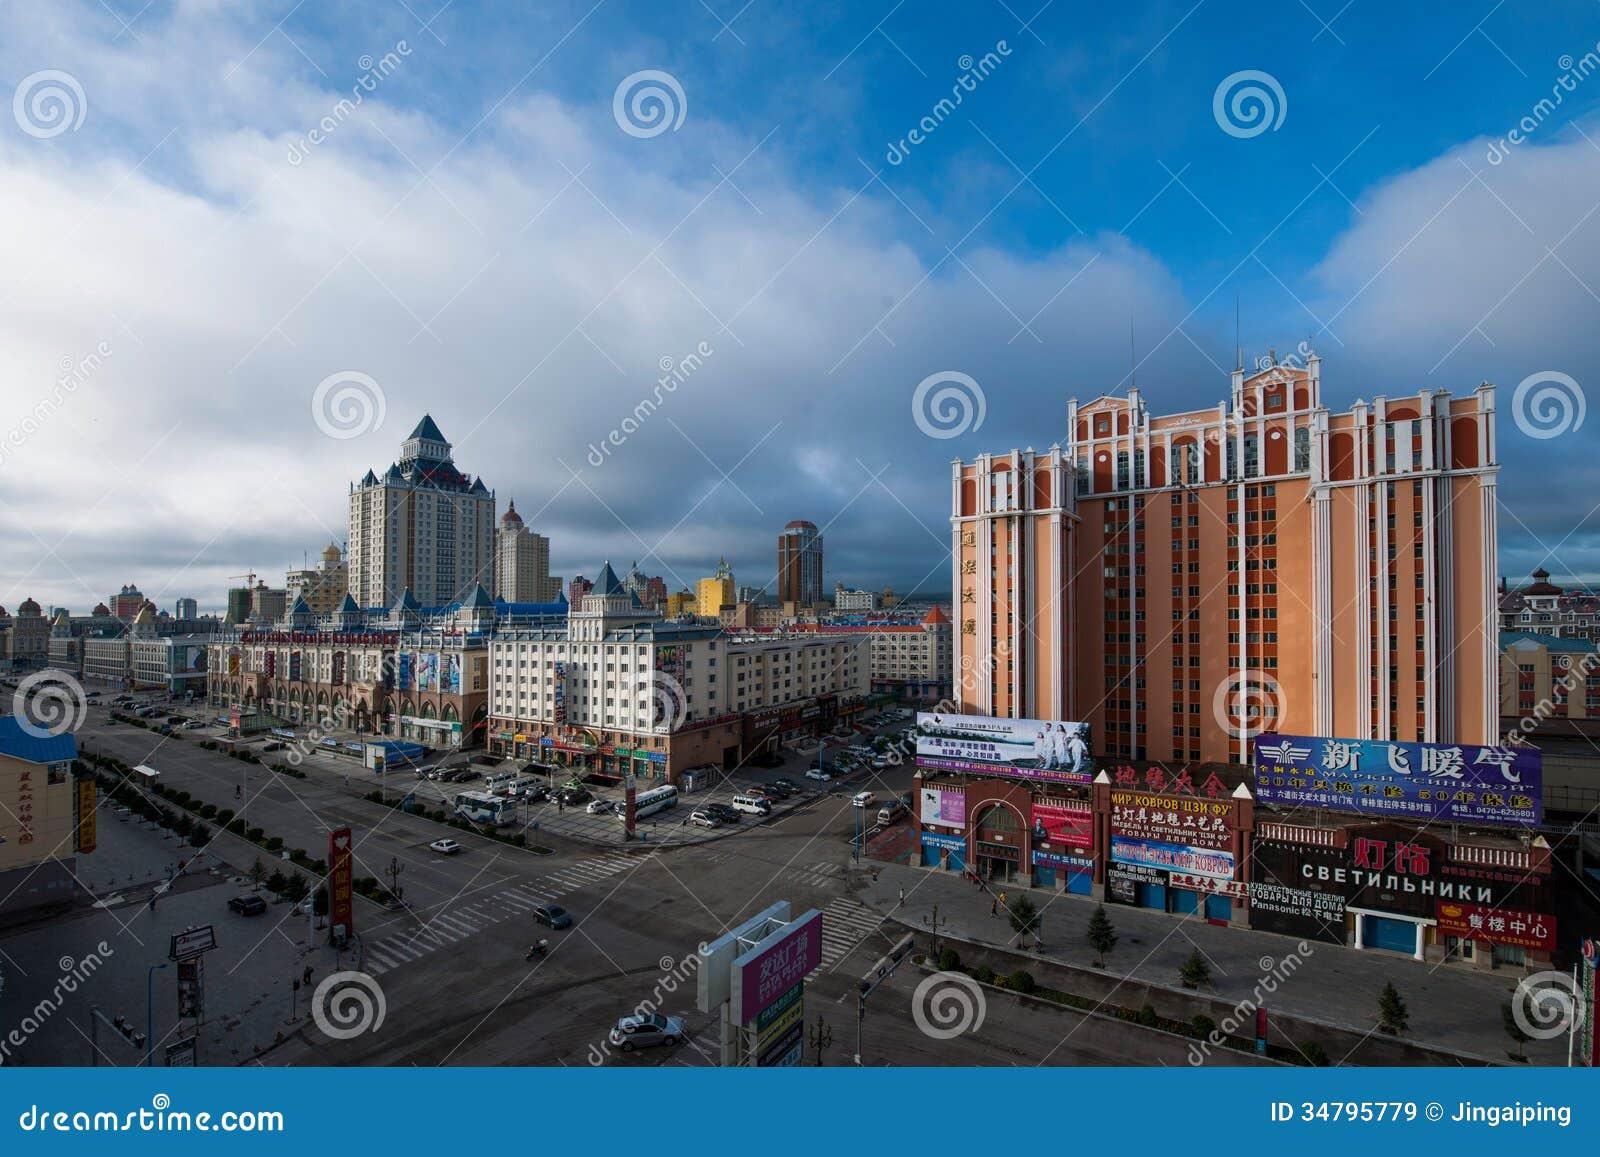 hulunbeier manchuria streetscape editorial stock image